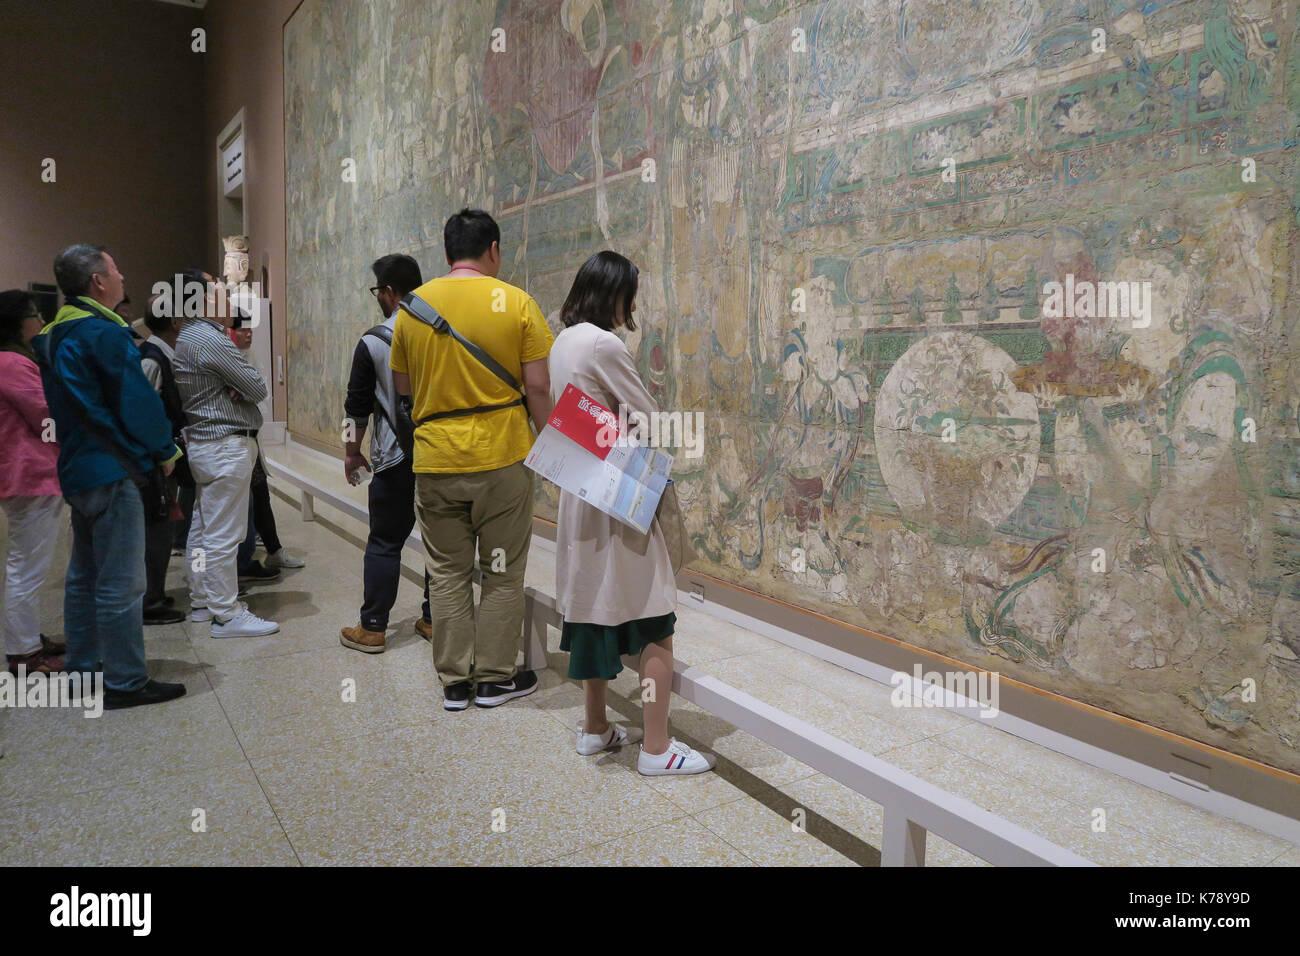 Metropolitan Museum of Art, NYC, USA - Stock Image